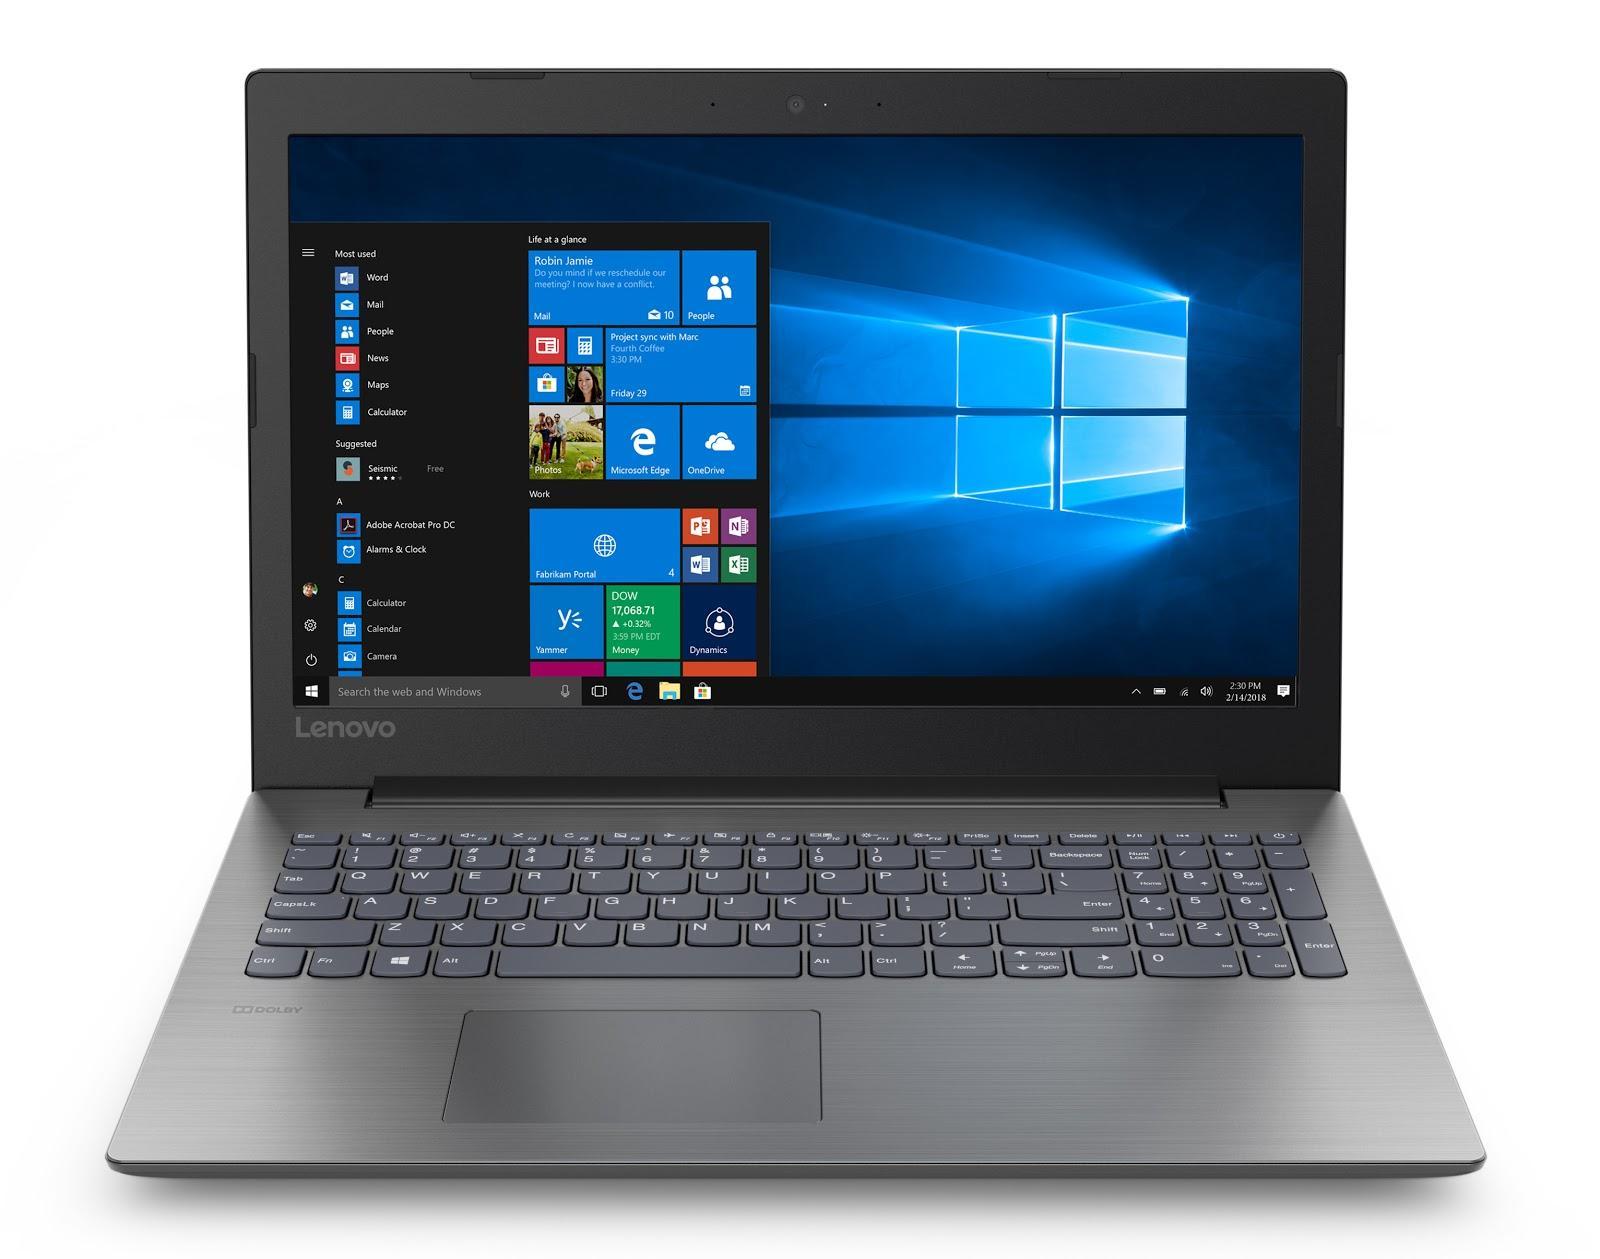 Фото 1. Ноутбук Lenovo ideapad 330-15 Onyx Black (81DE01PKRA)